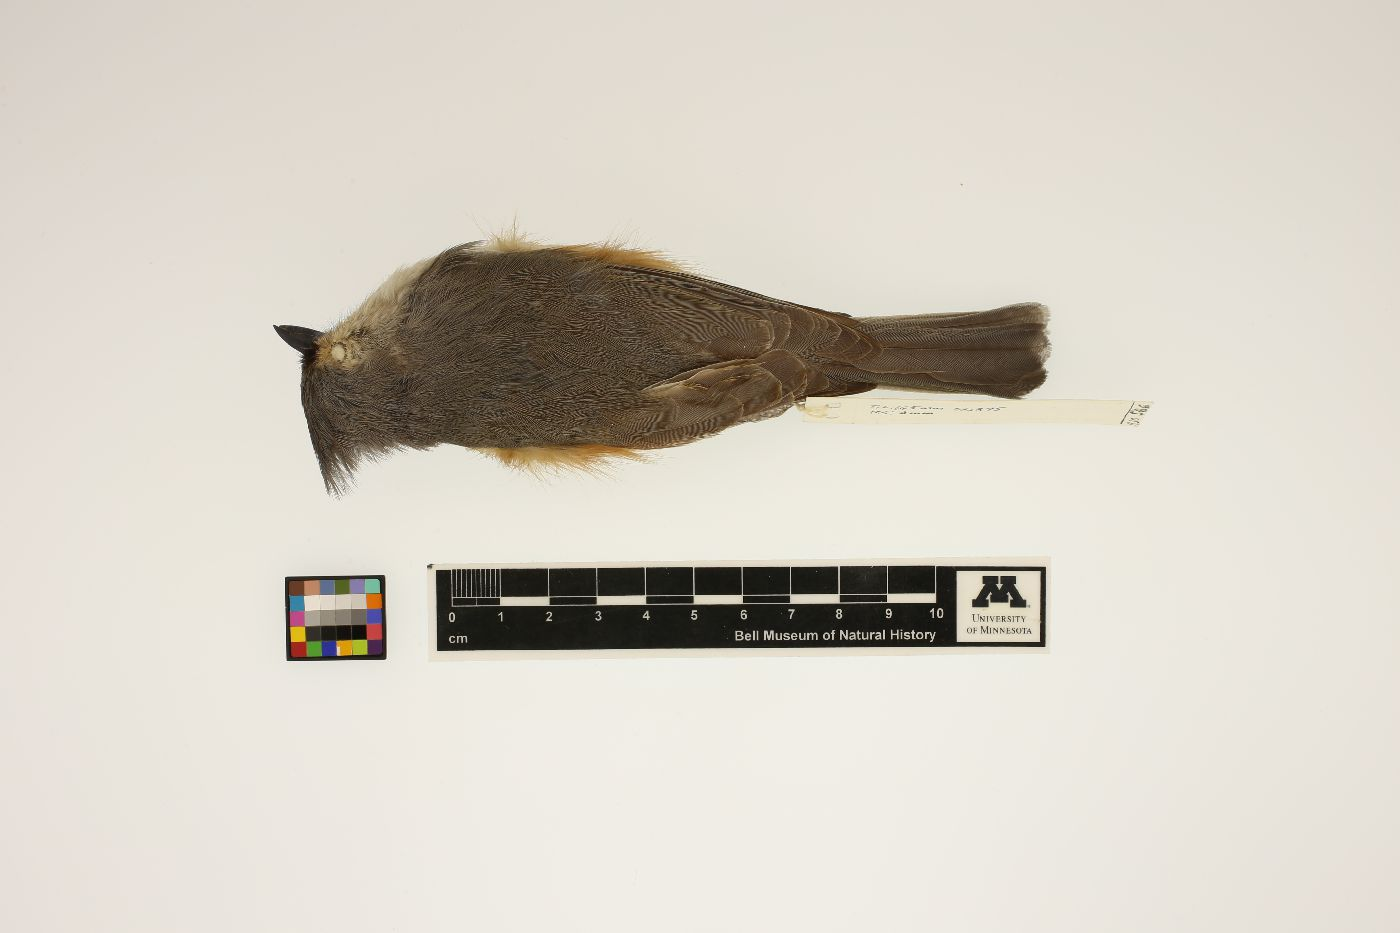 Parus bicolor image